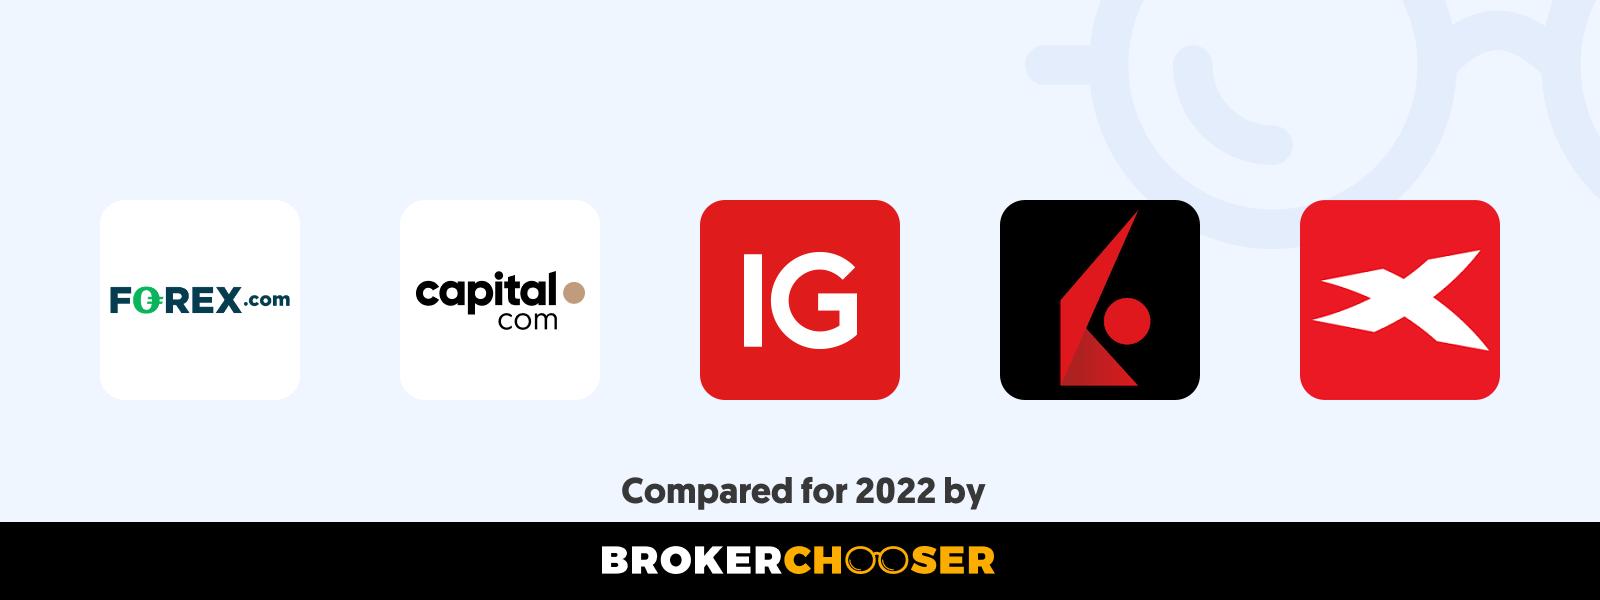 Best forex brokers for beginners in Aruba in 2021